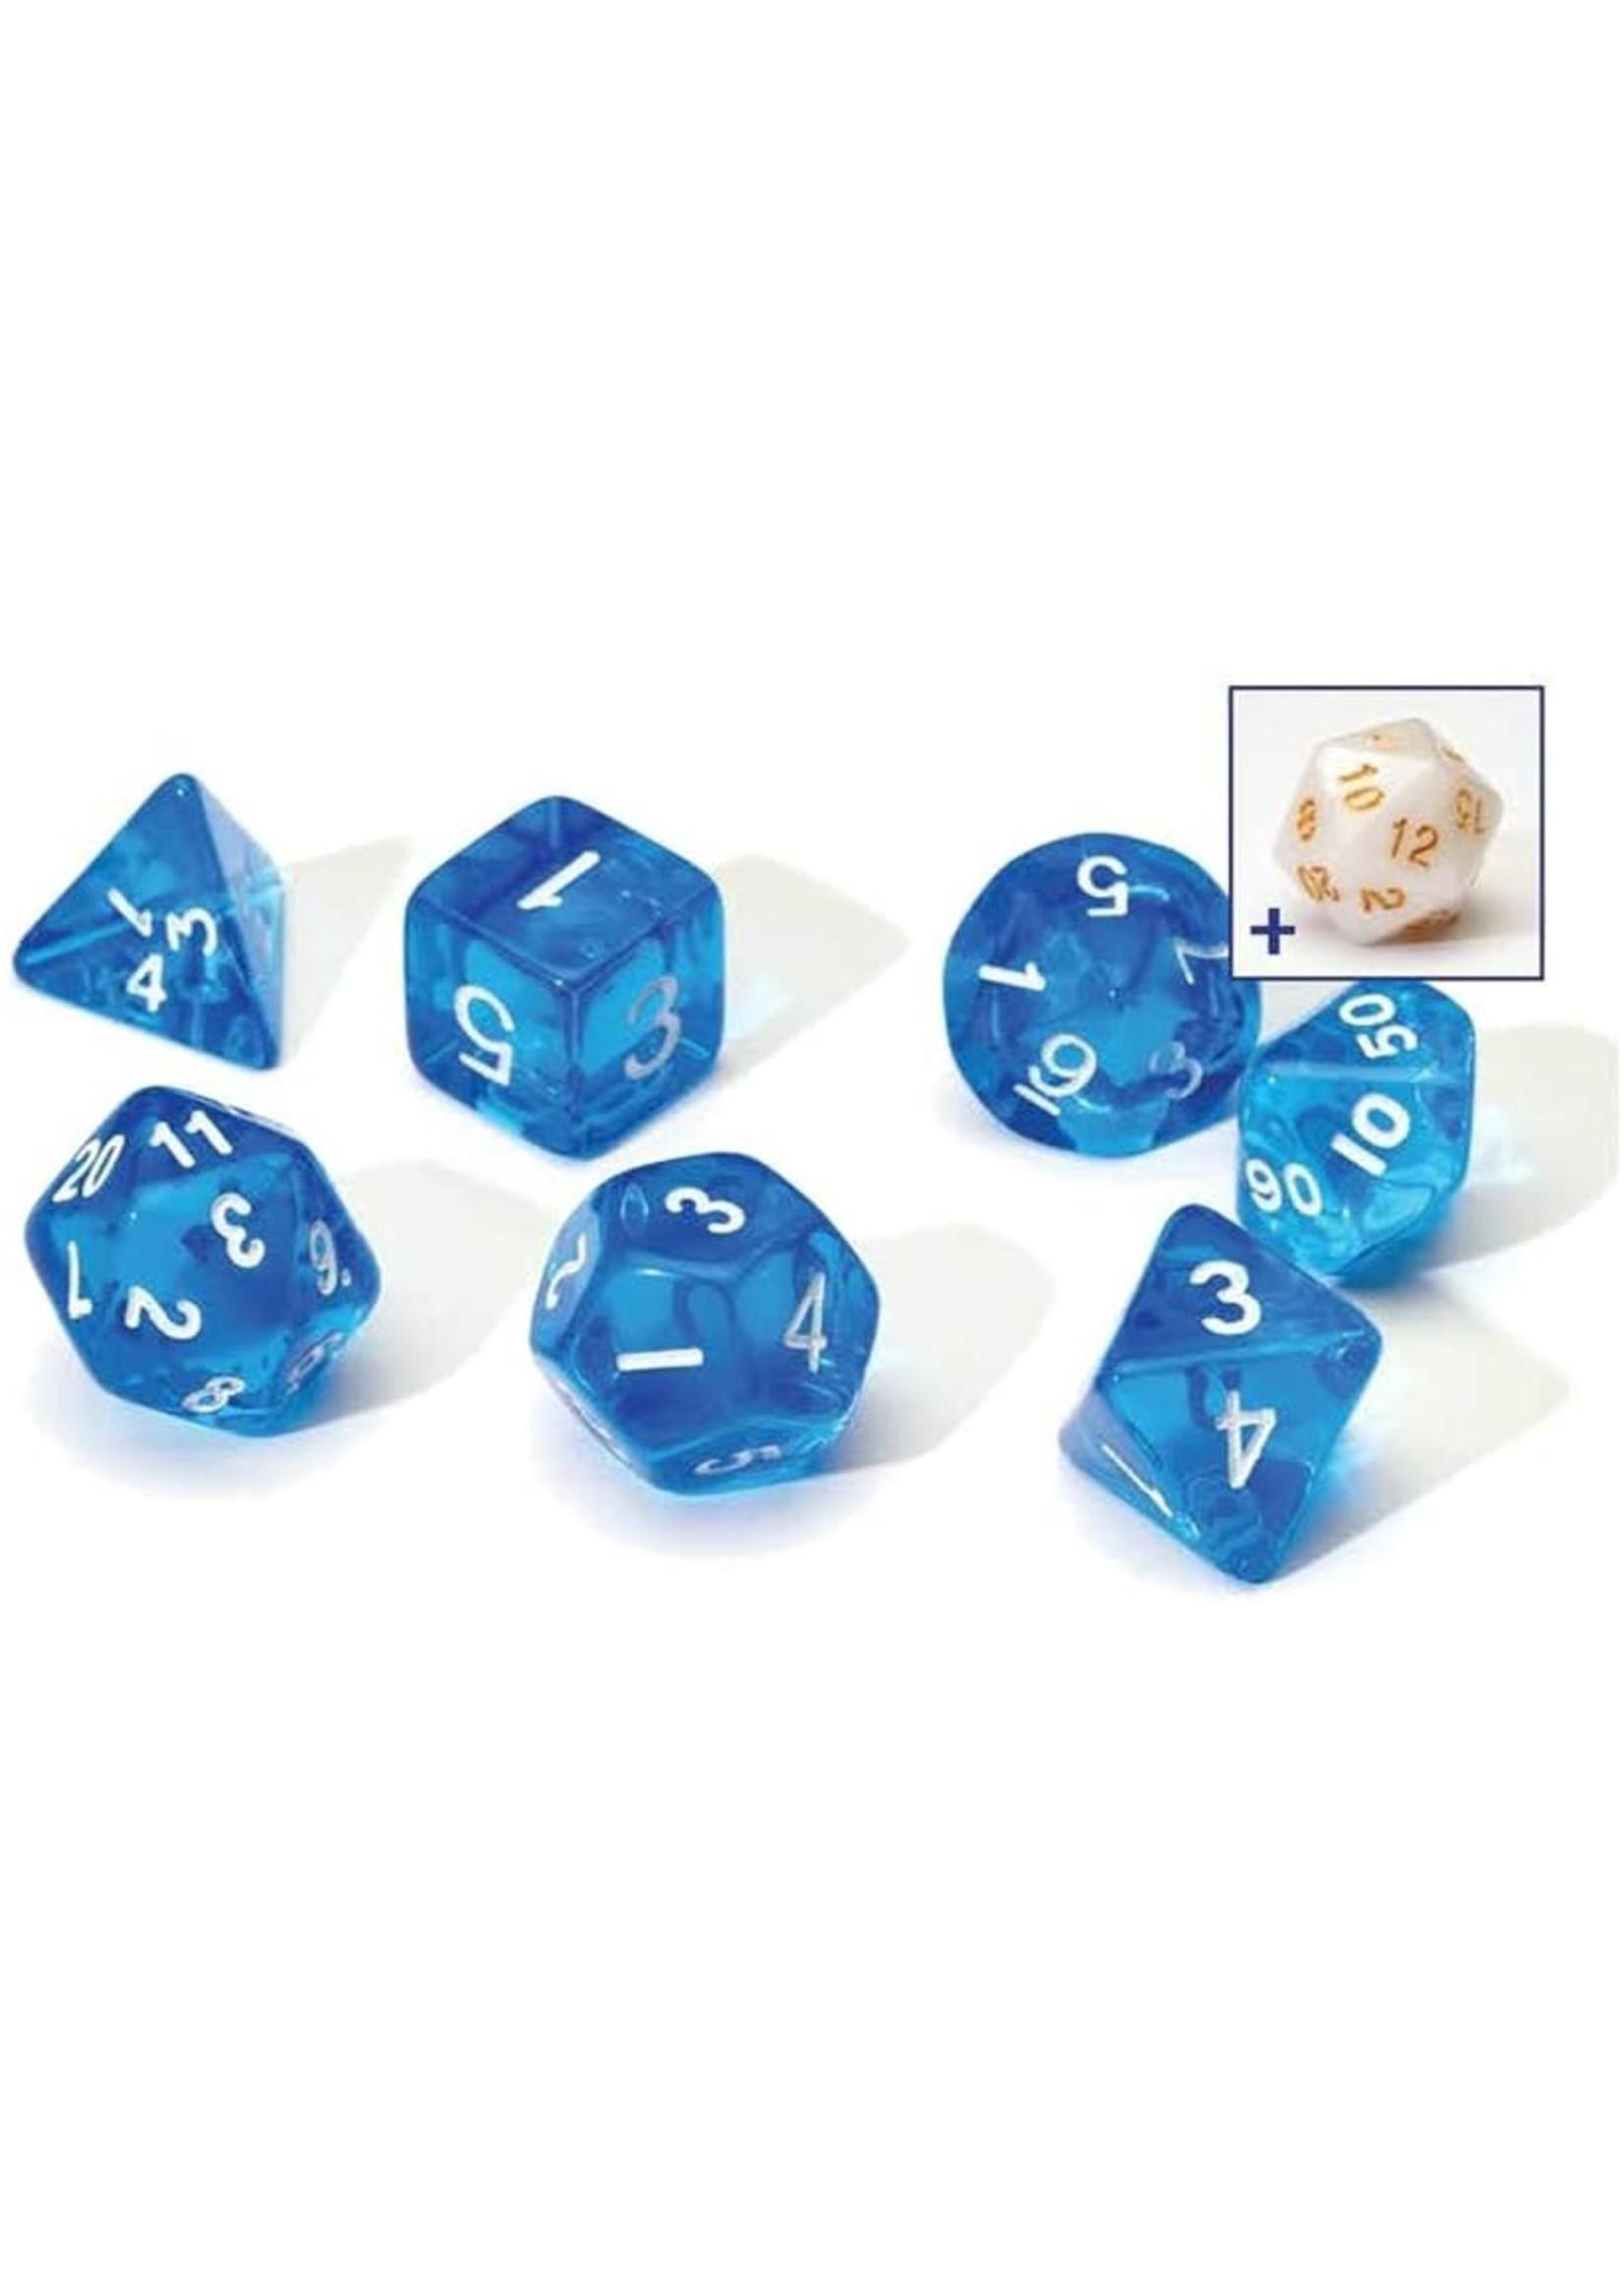 RPG Dice Set (7): Translucent Blue Resin